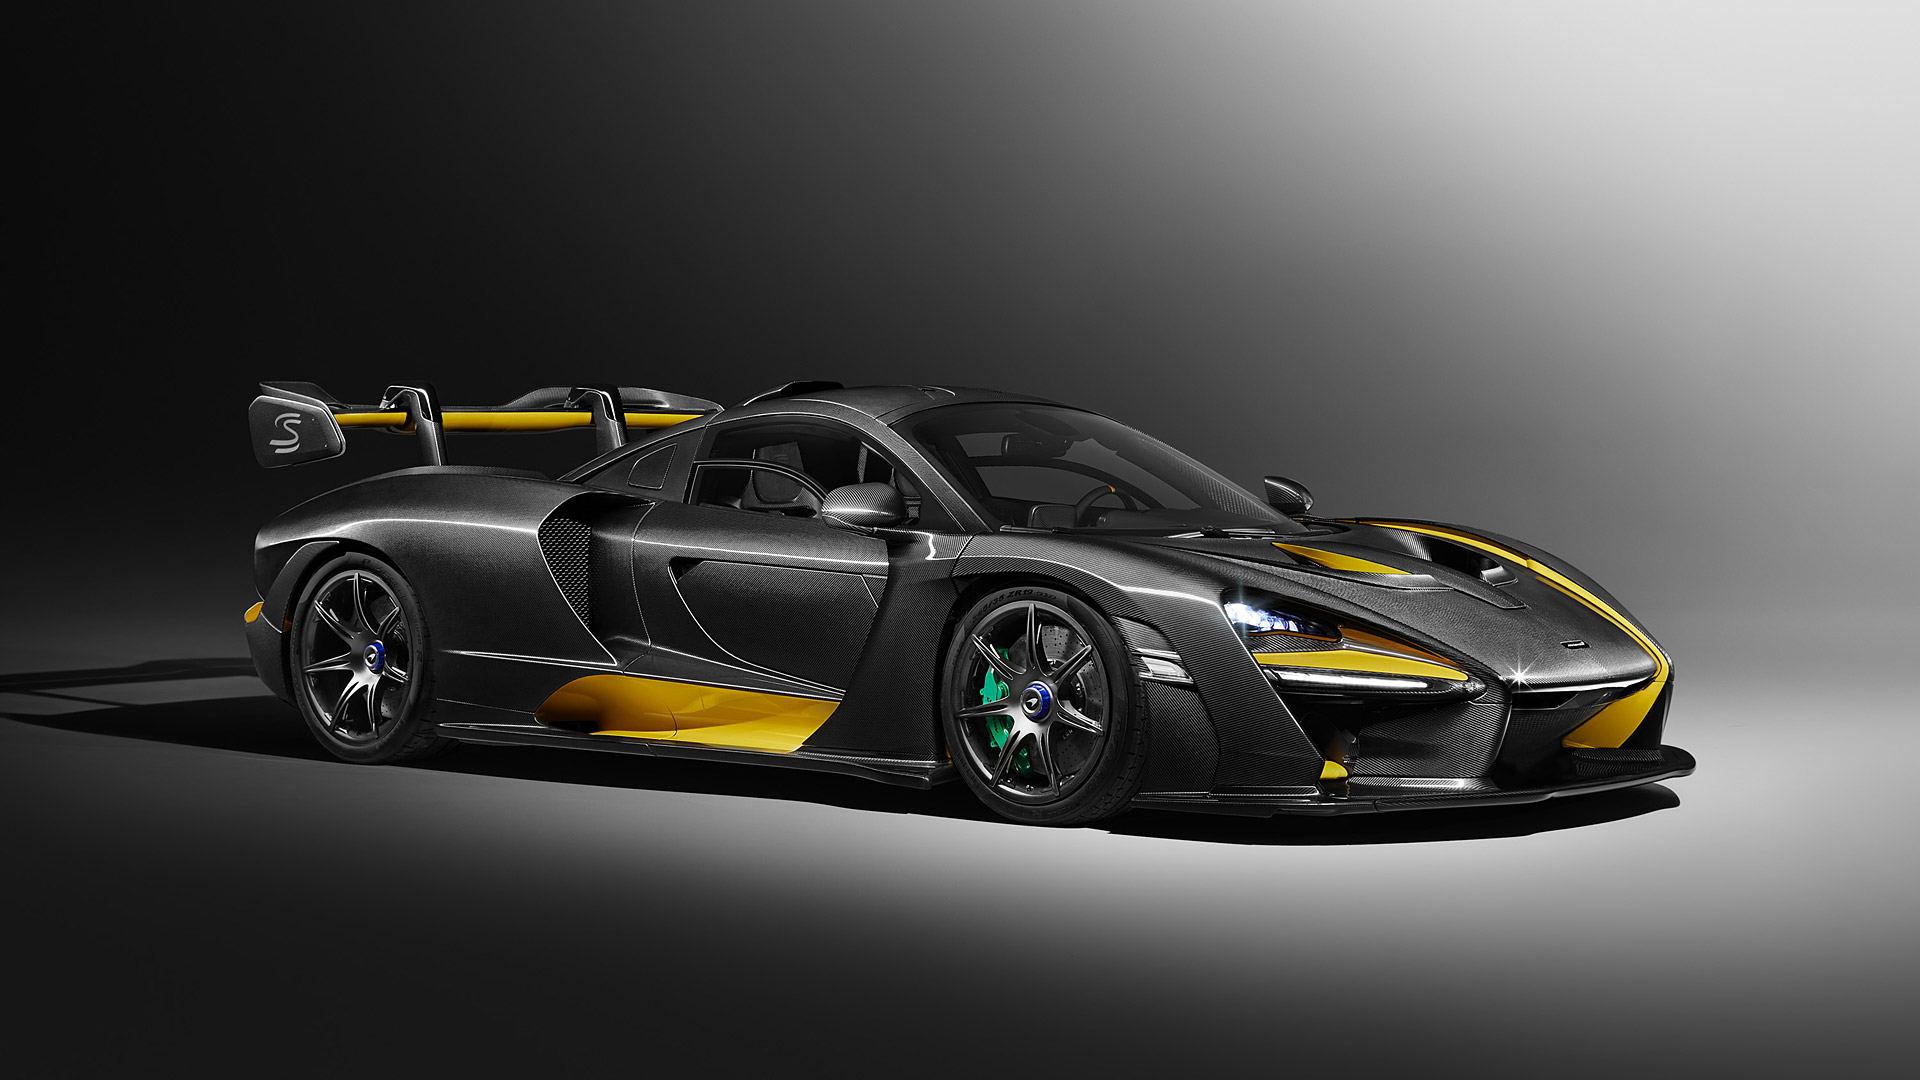 2019 McLaren Senna Carbon Theme by MSO